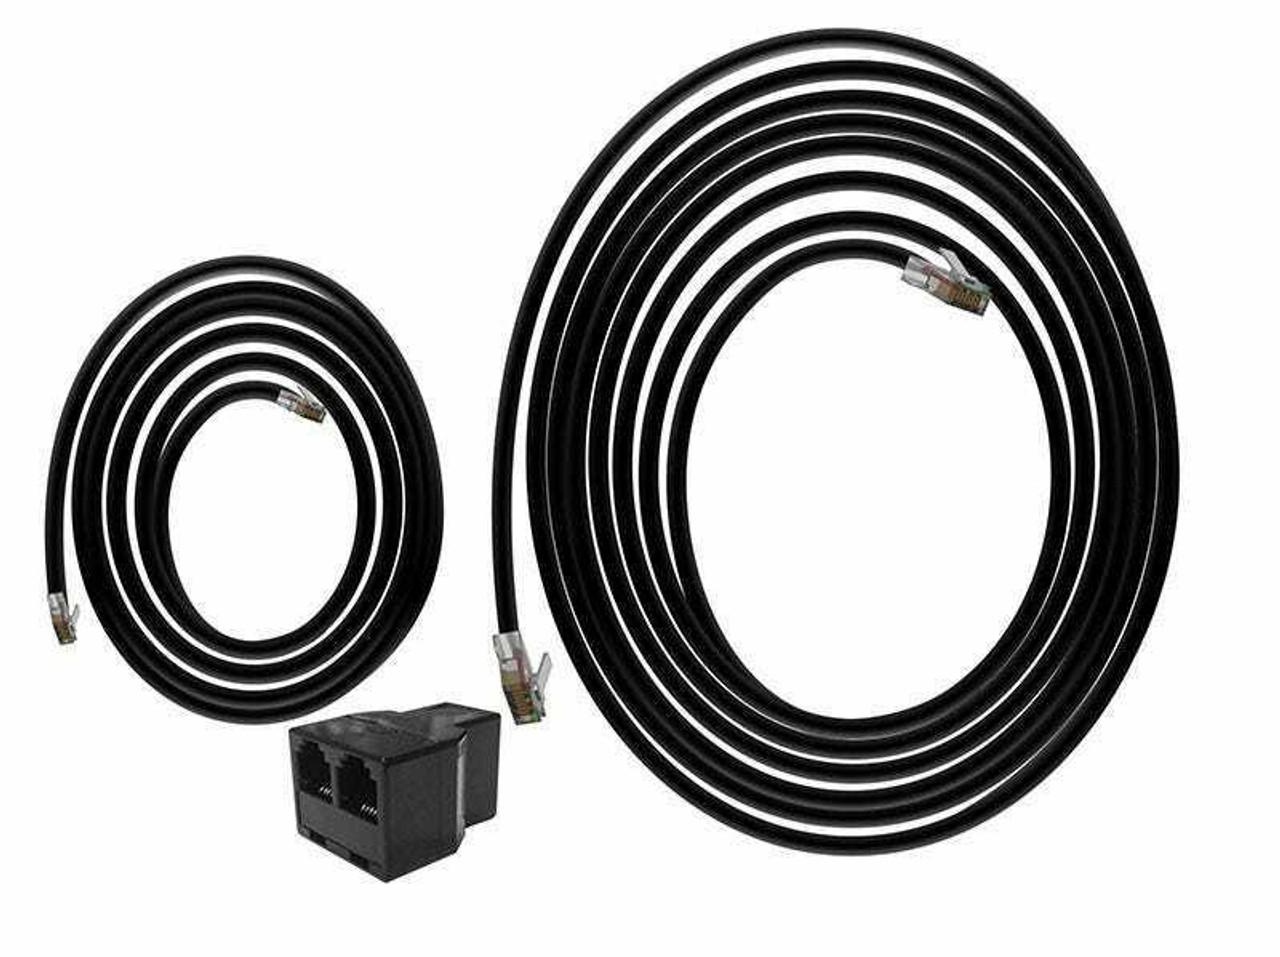 Hydro-X RJ12 Extension Cable Set - 1